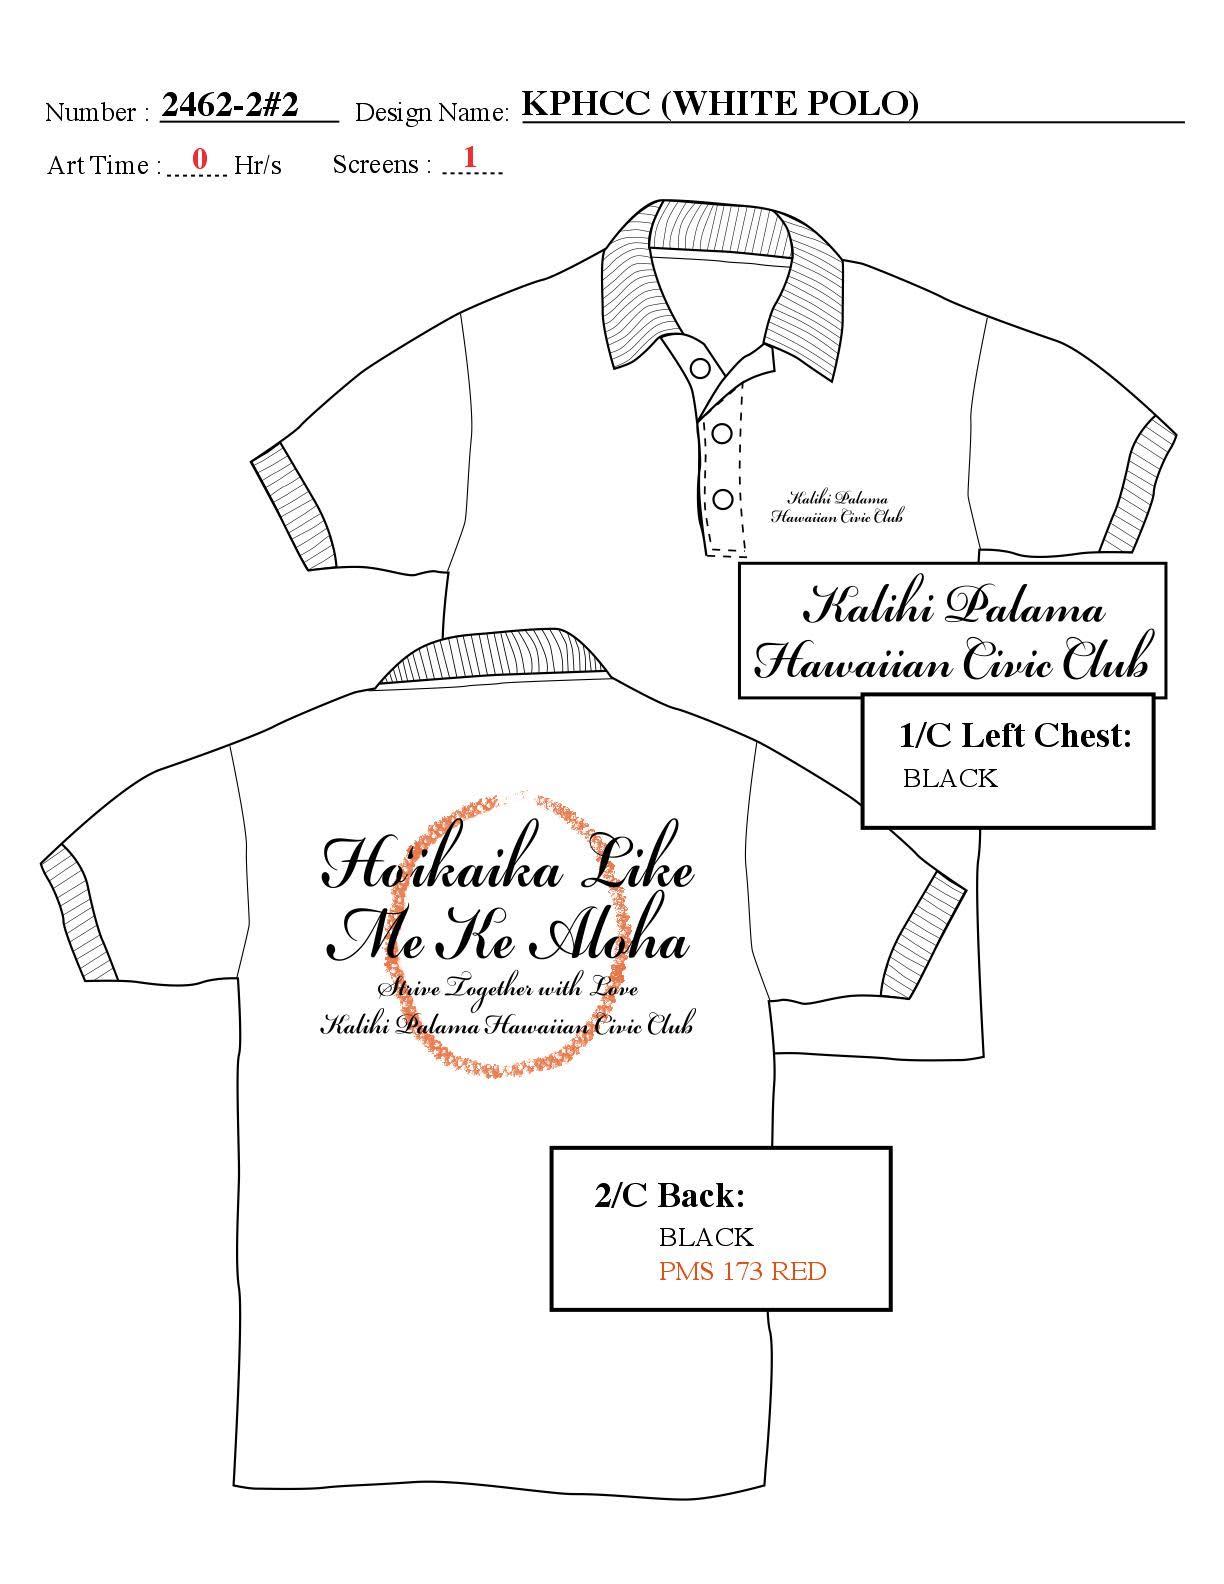 Kalihi Palama Hawaiian Civic Club 2016 Polo-style Shirt Design